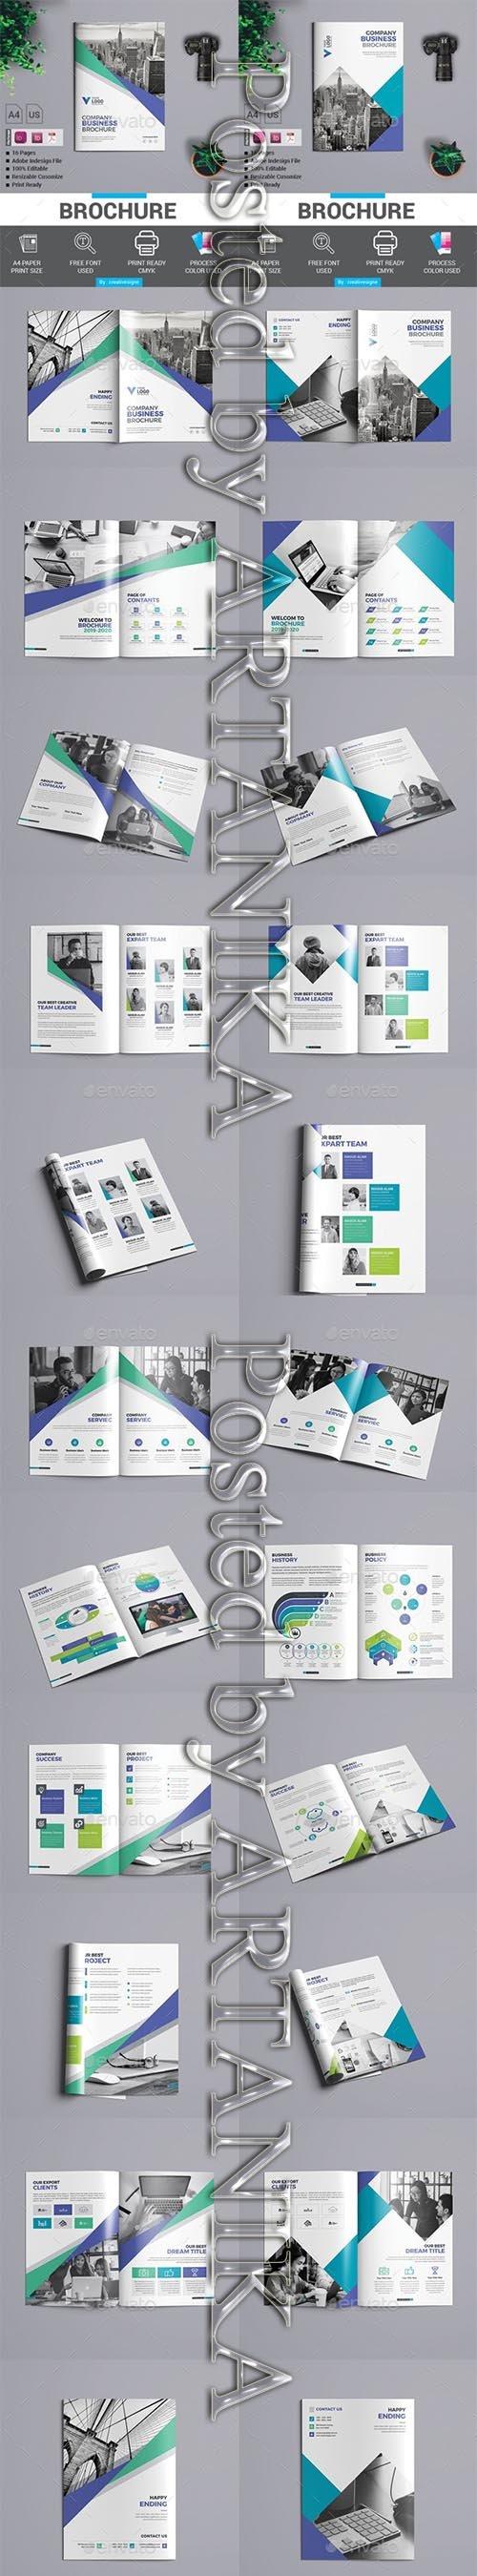 Brochure Bundle 2 in 1 23766669